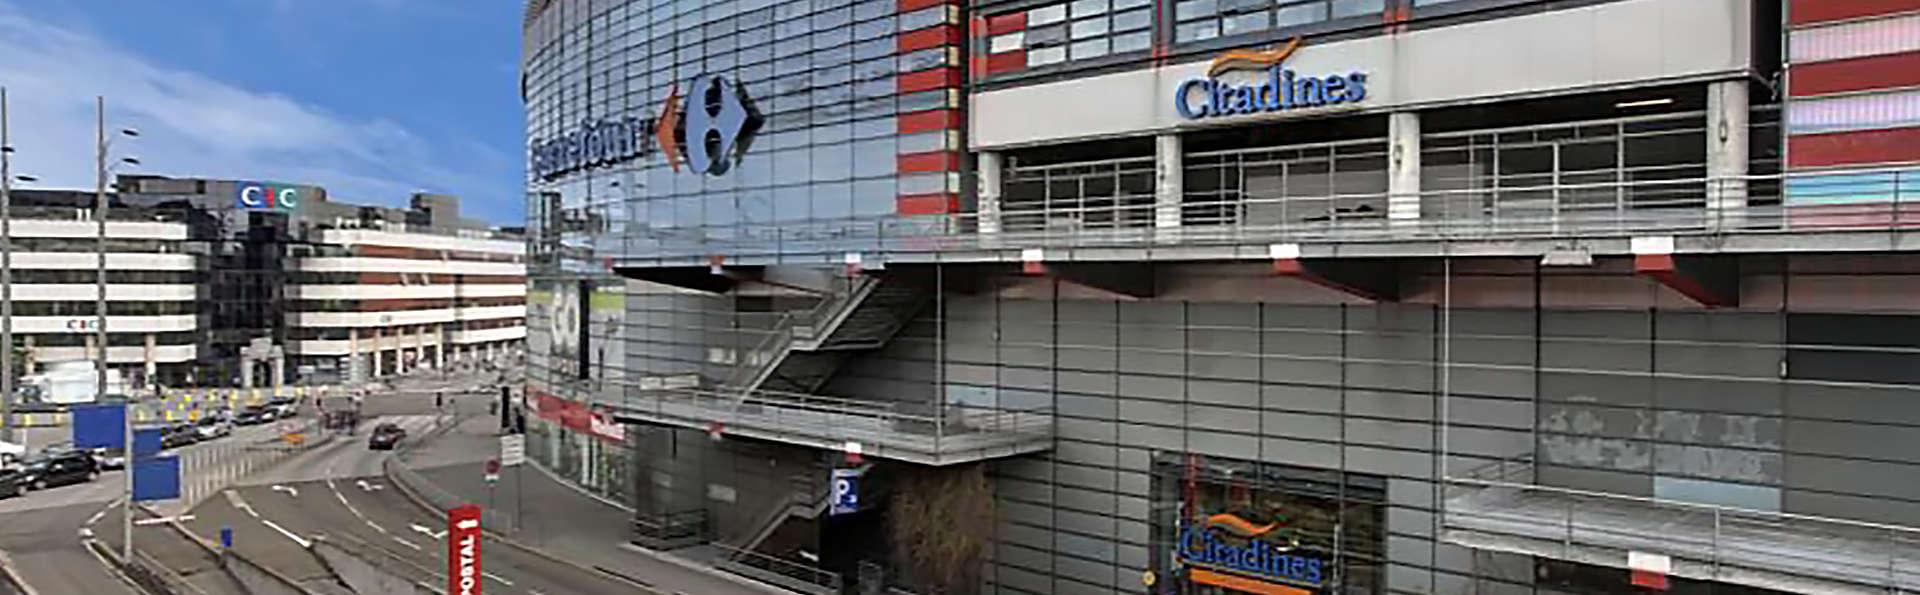 Citadines Lille Centre - EDIT_facade.jpg